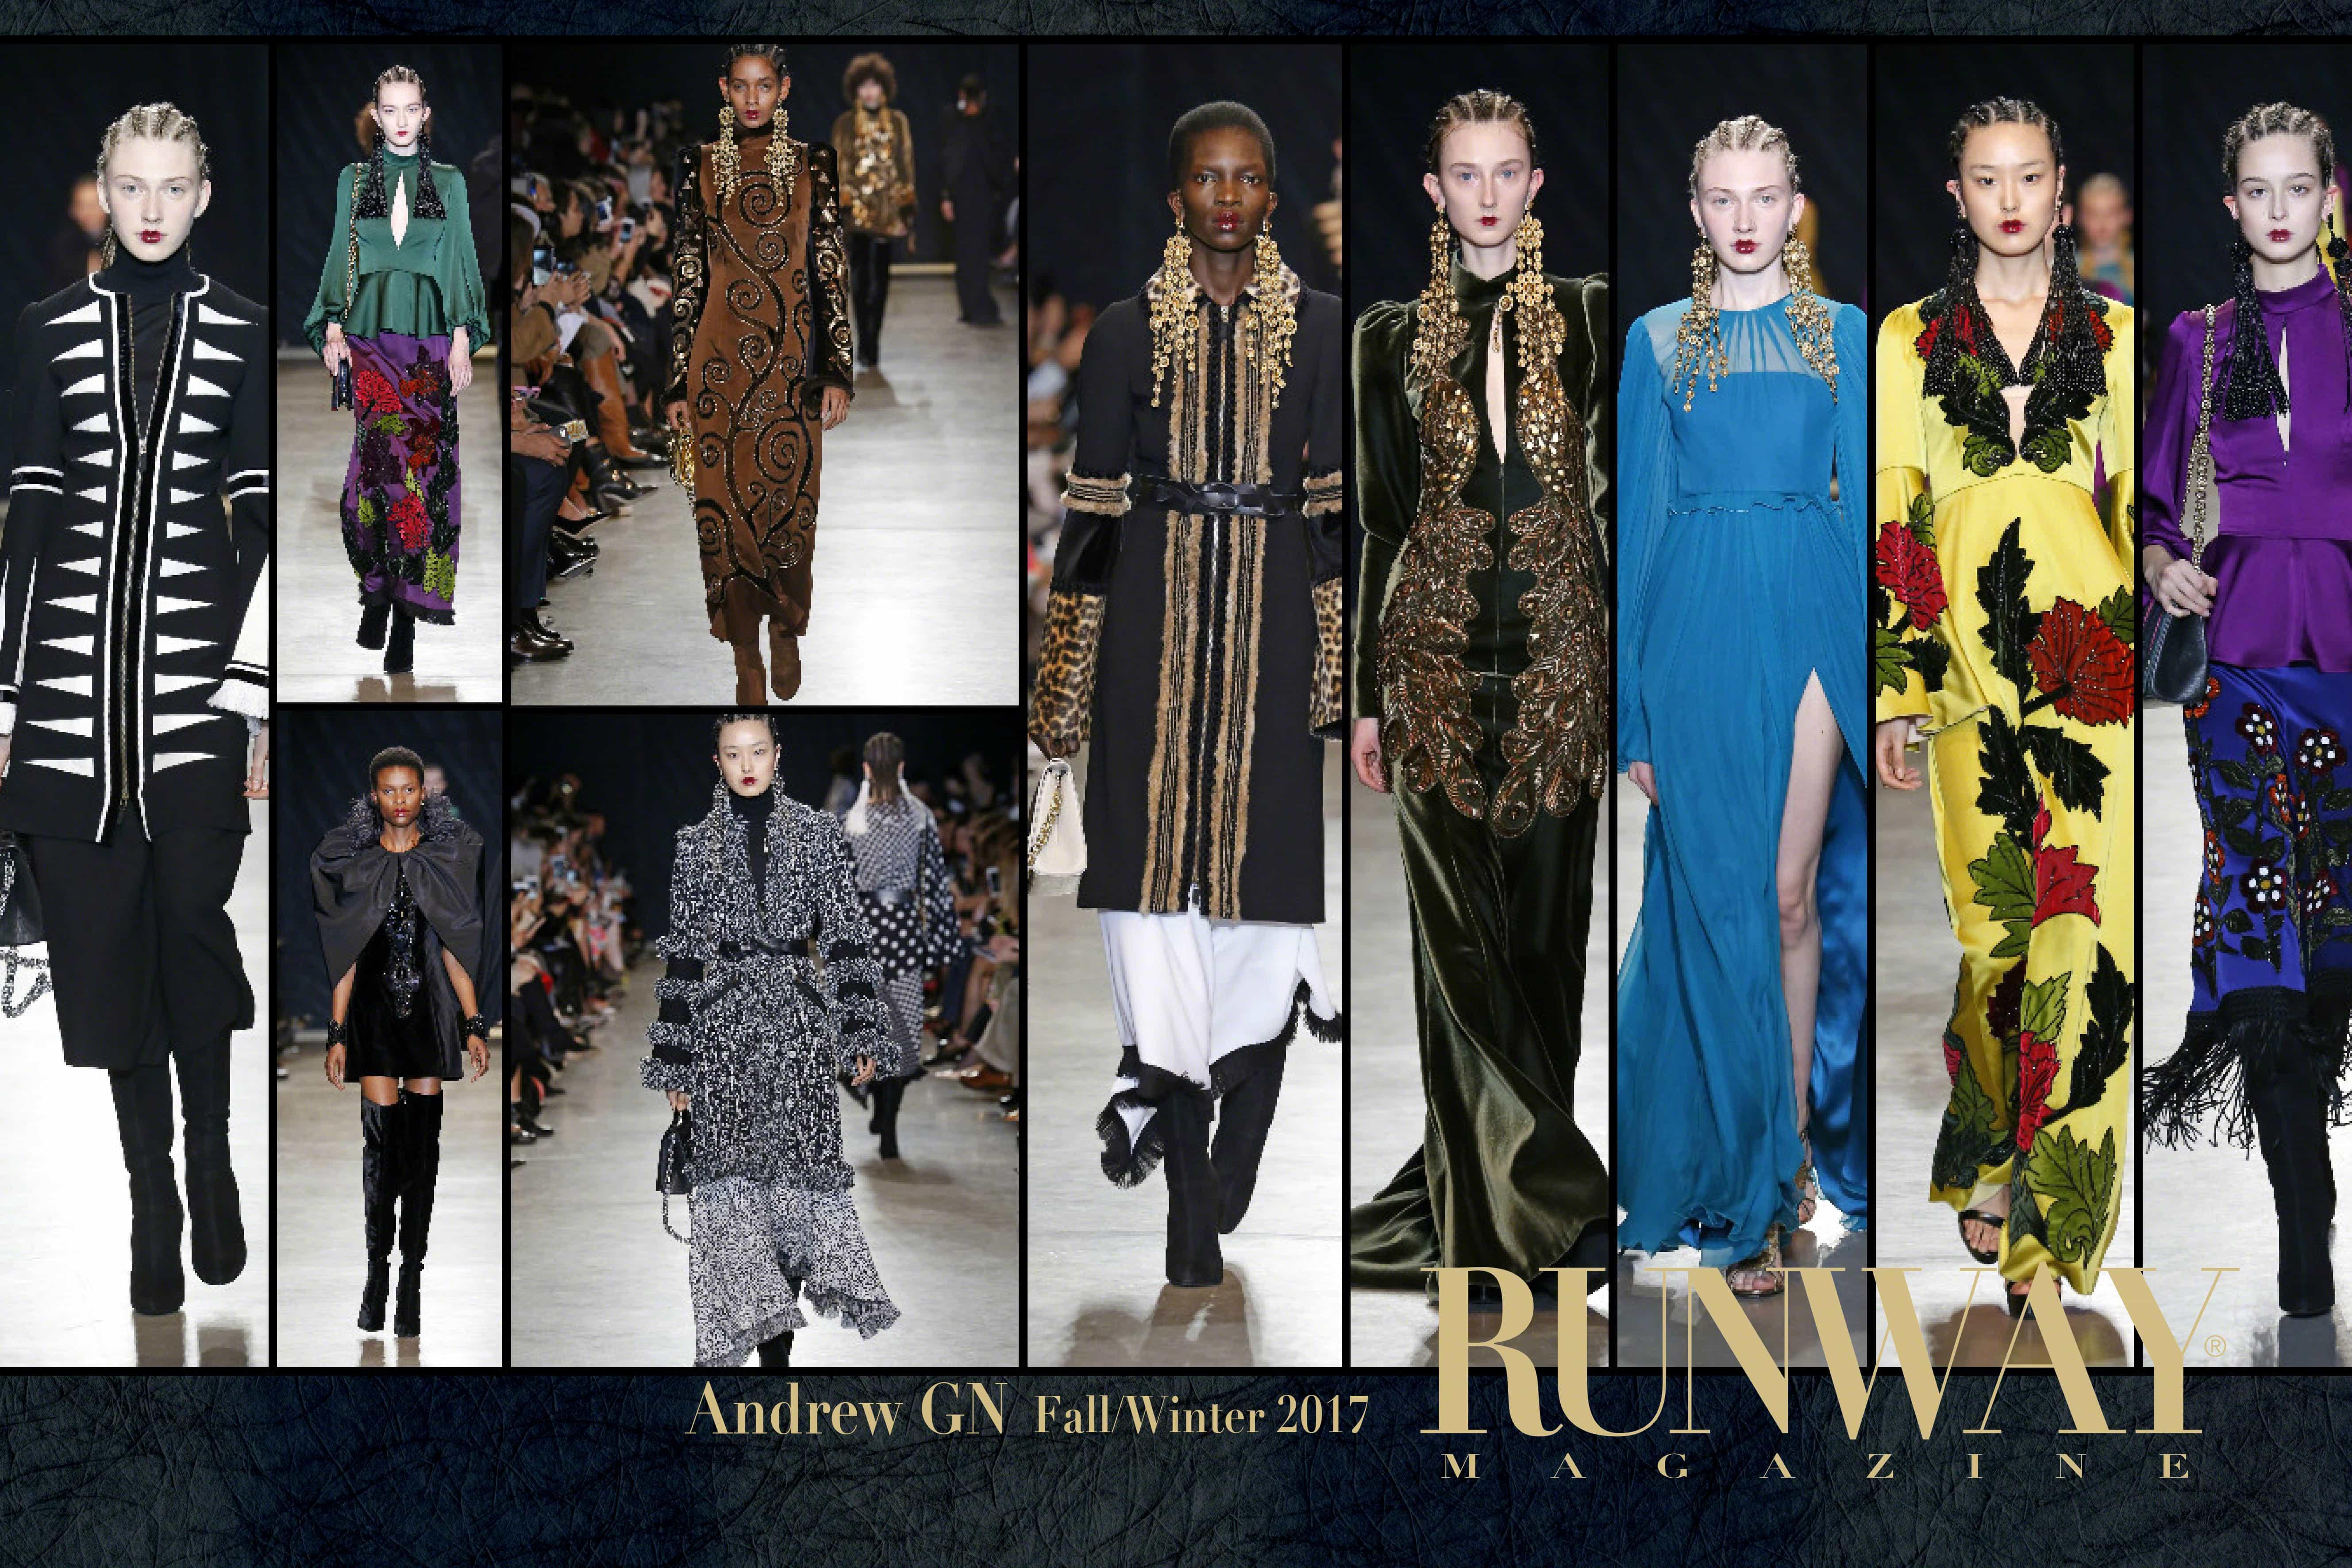 Andrew-GN-PFW-Eleonora-de-Gray-Editor-in-Chief-Paris-NewYork-LosAngeles-Runway-Magazine